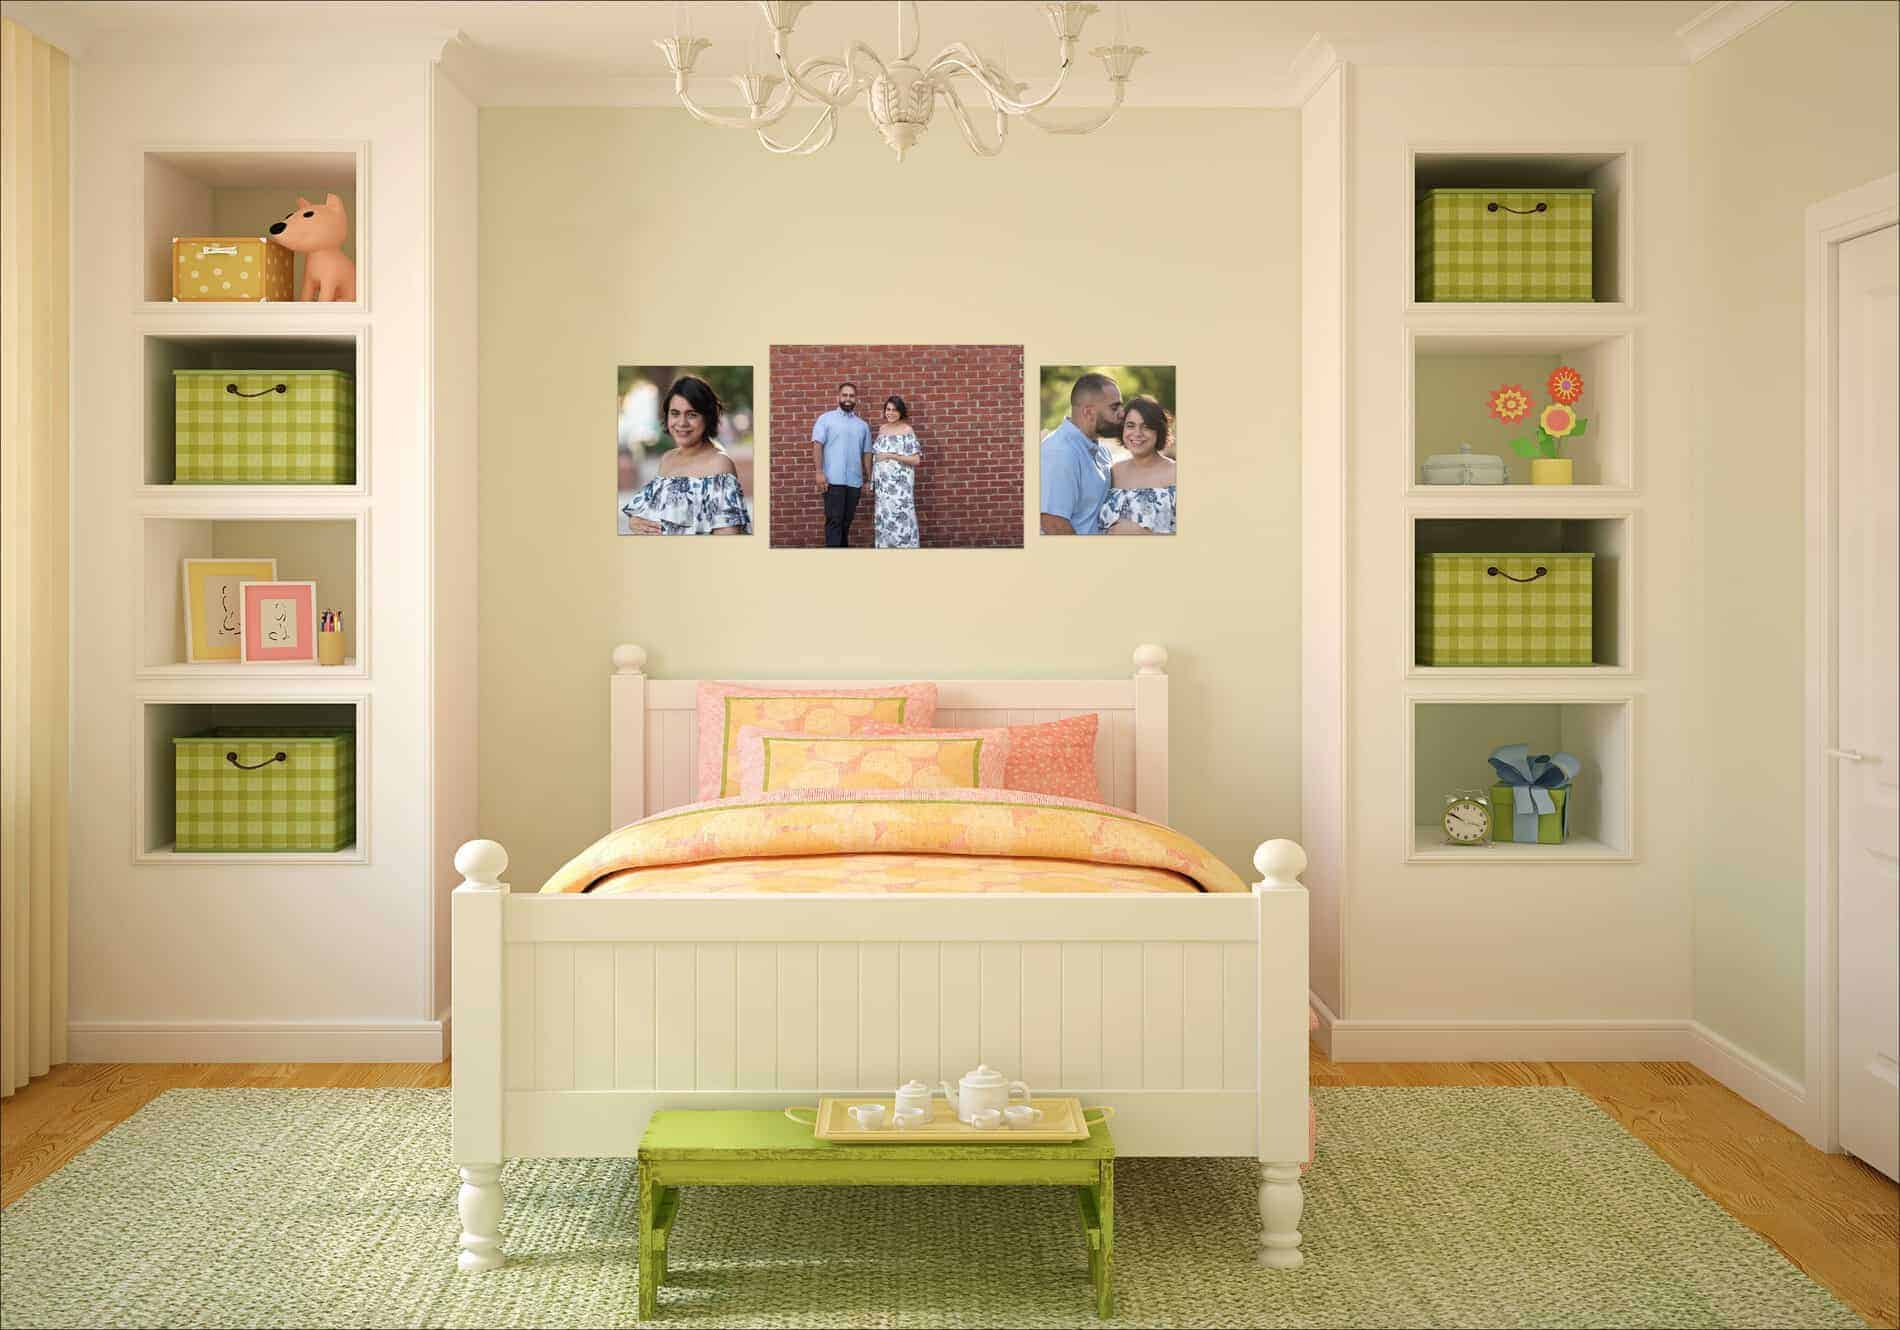 Room-2-4.jpg